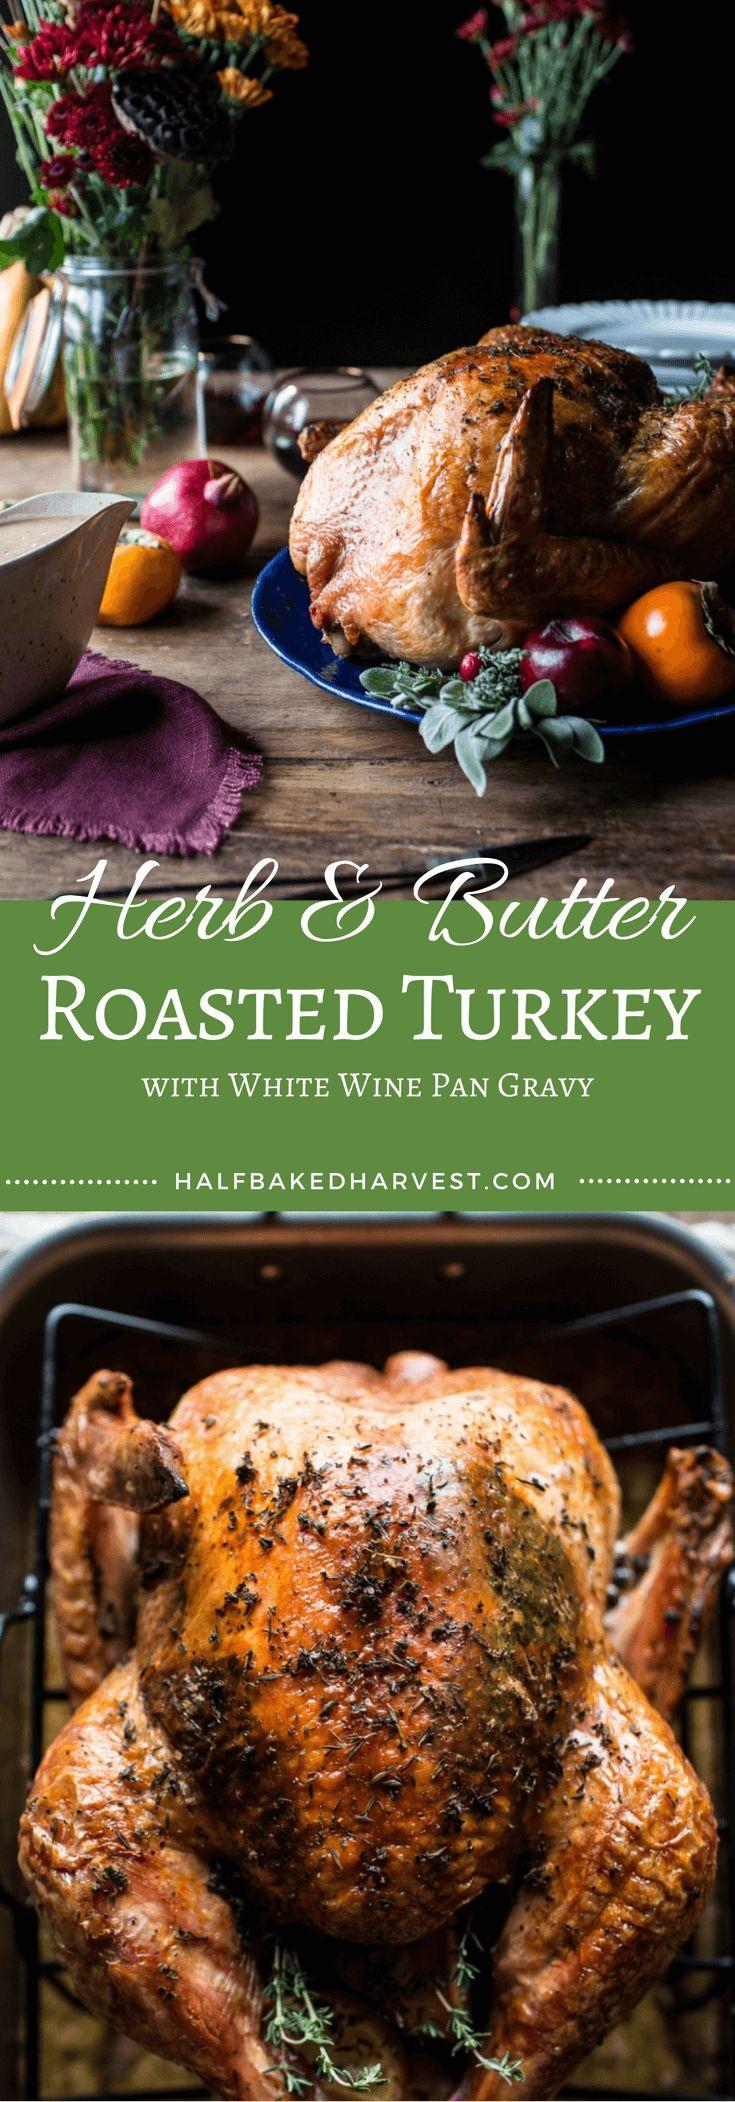 Best 25+ Roasted turkey ideas on Pinterest | Roast turkey ...